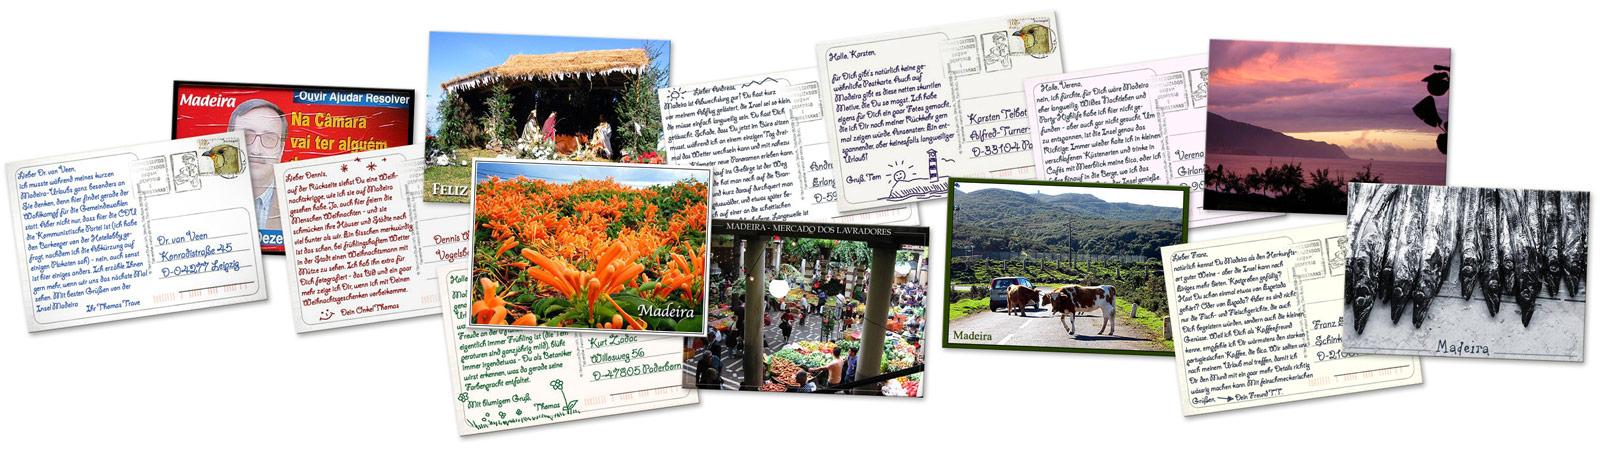 Madeira Reiseprojekt